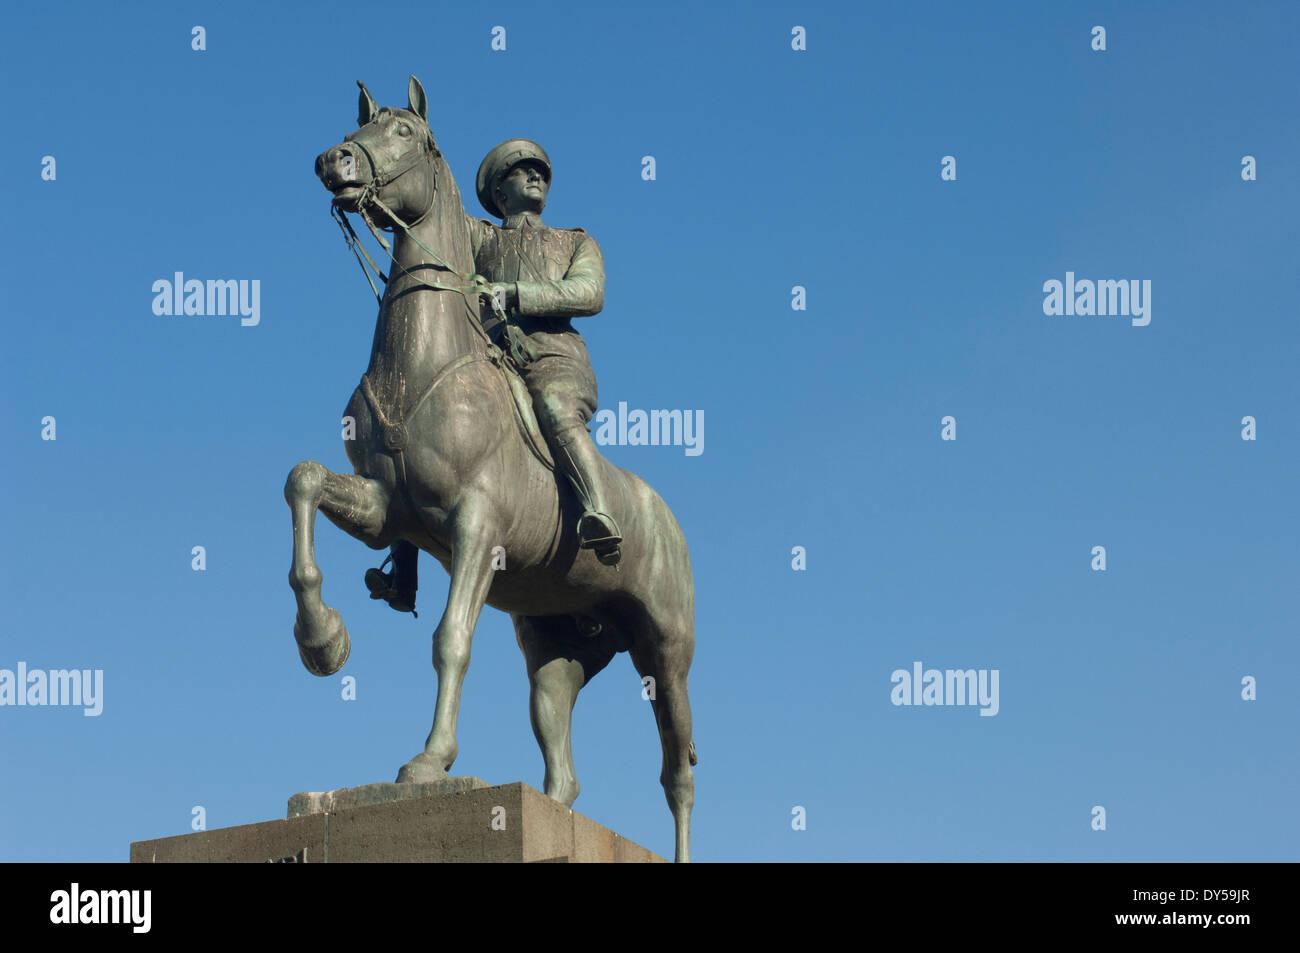 Statue von Mustafa Kemal Atatürk, Gründer der modernen Türkei, Izmir, Türkei. Stockbild